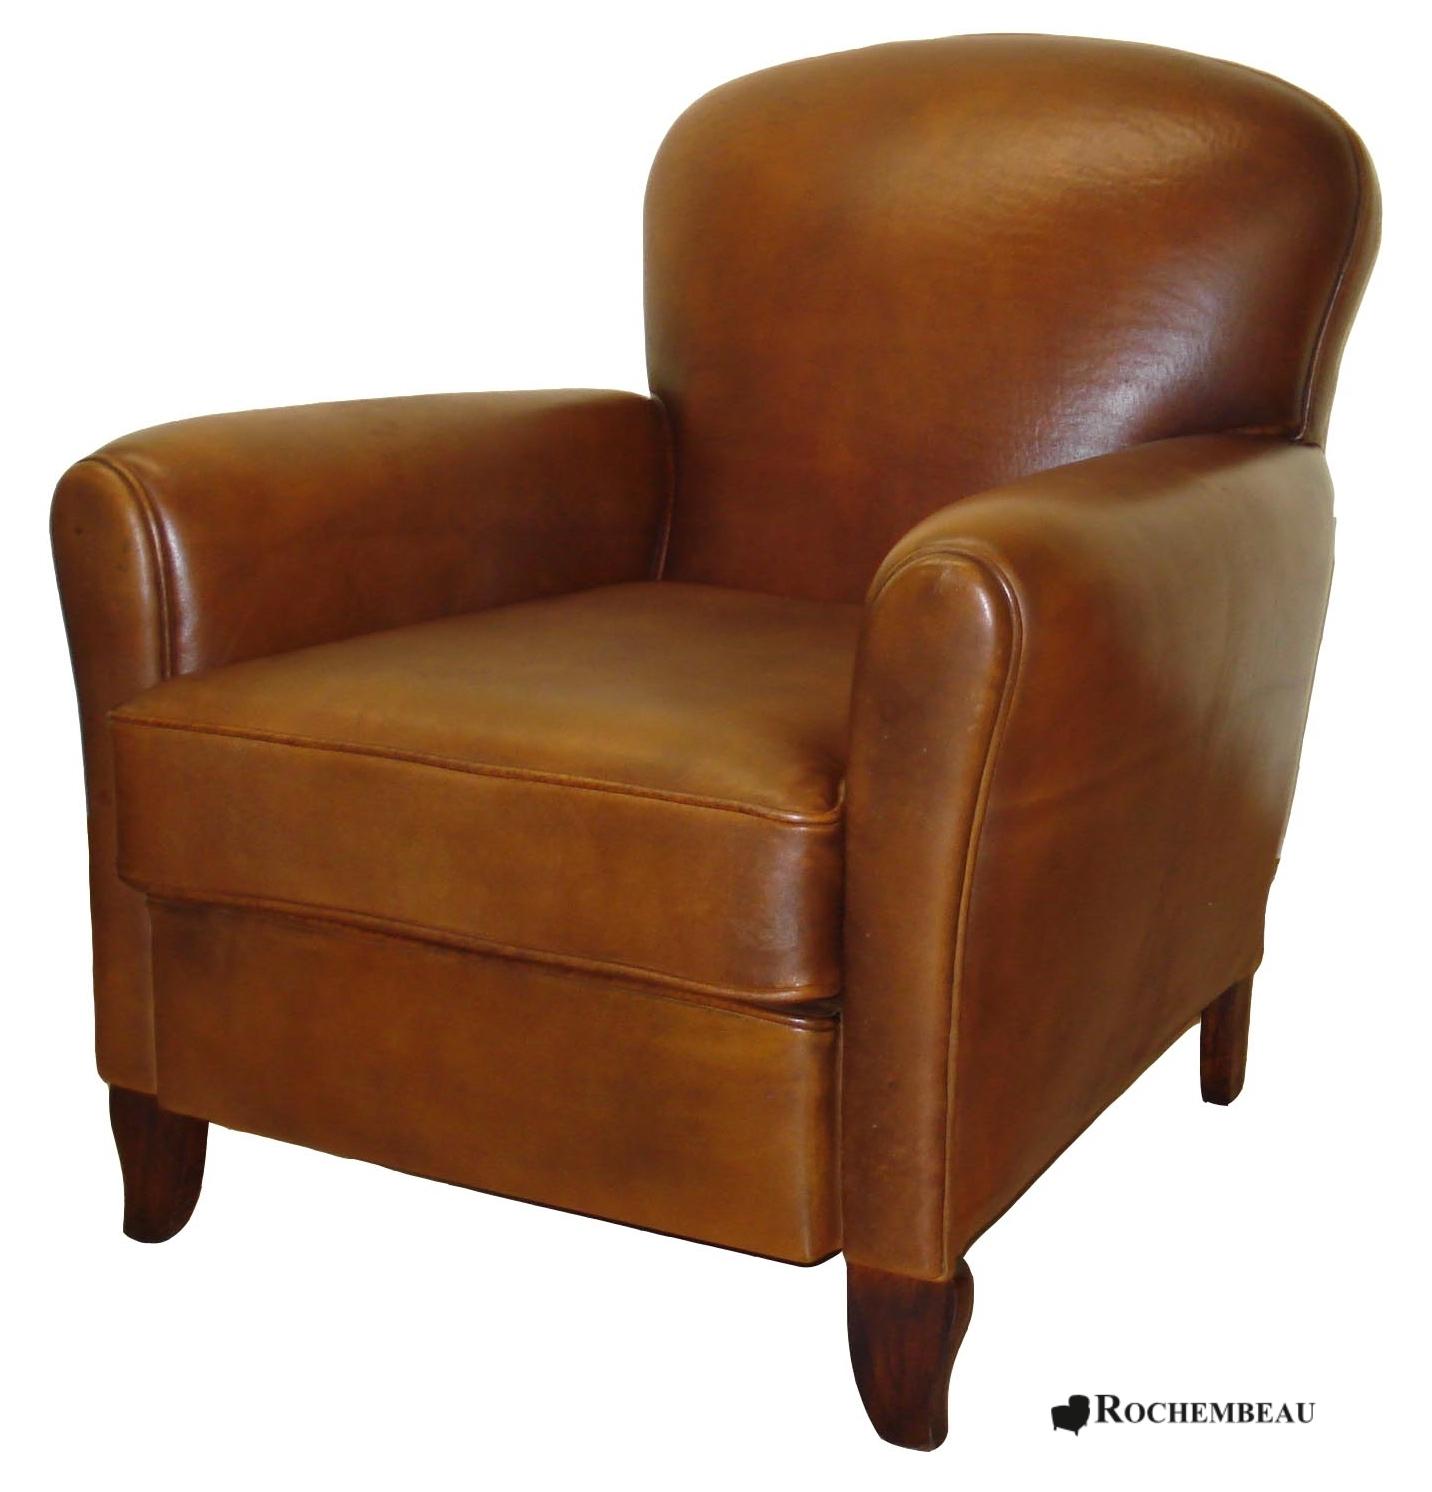 fauteuil club portsmouth fauteuil club en cuir basane. Black Bedroom Furniture Sets. Home Design Ideas